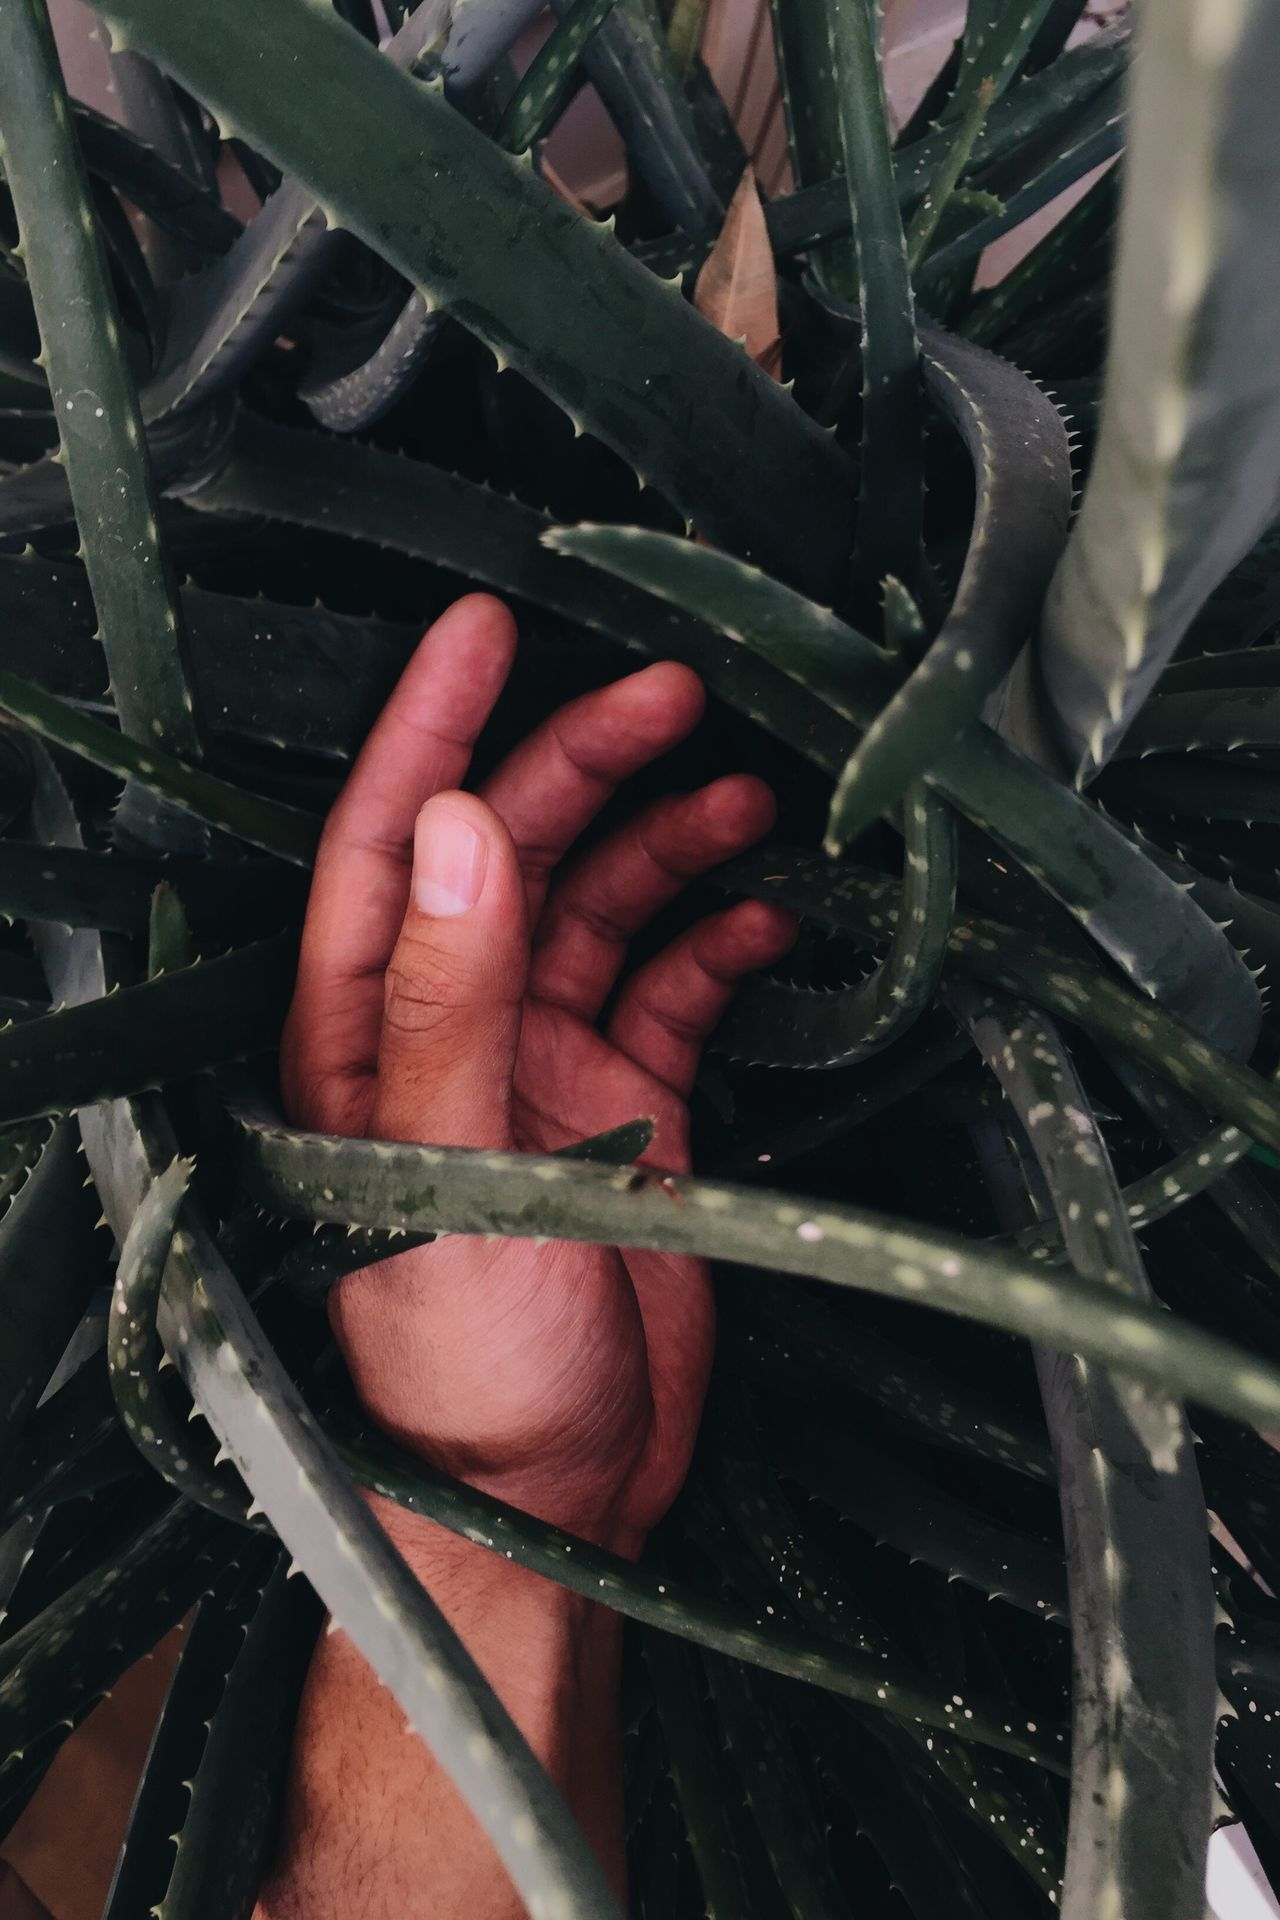 Thorn Splinter Prickle Nature Green Hand